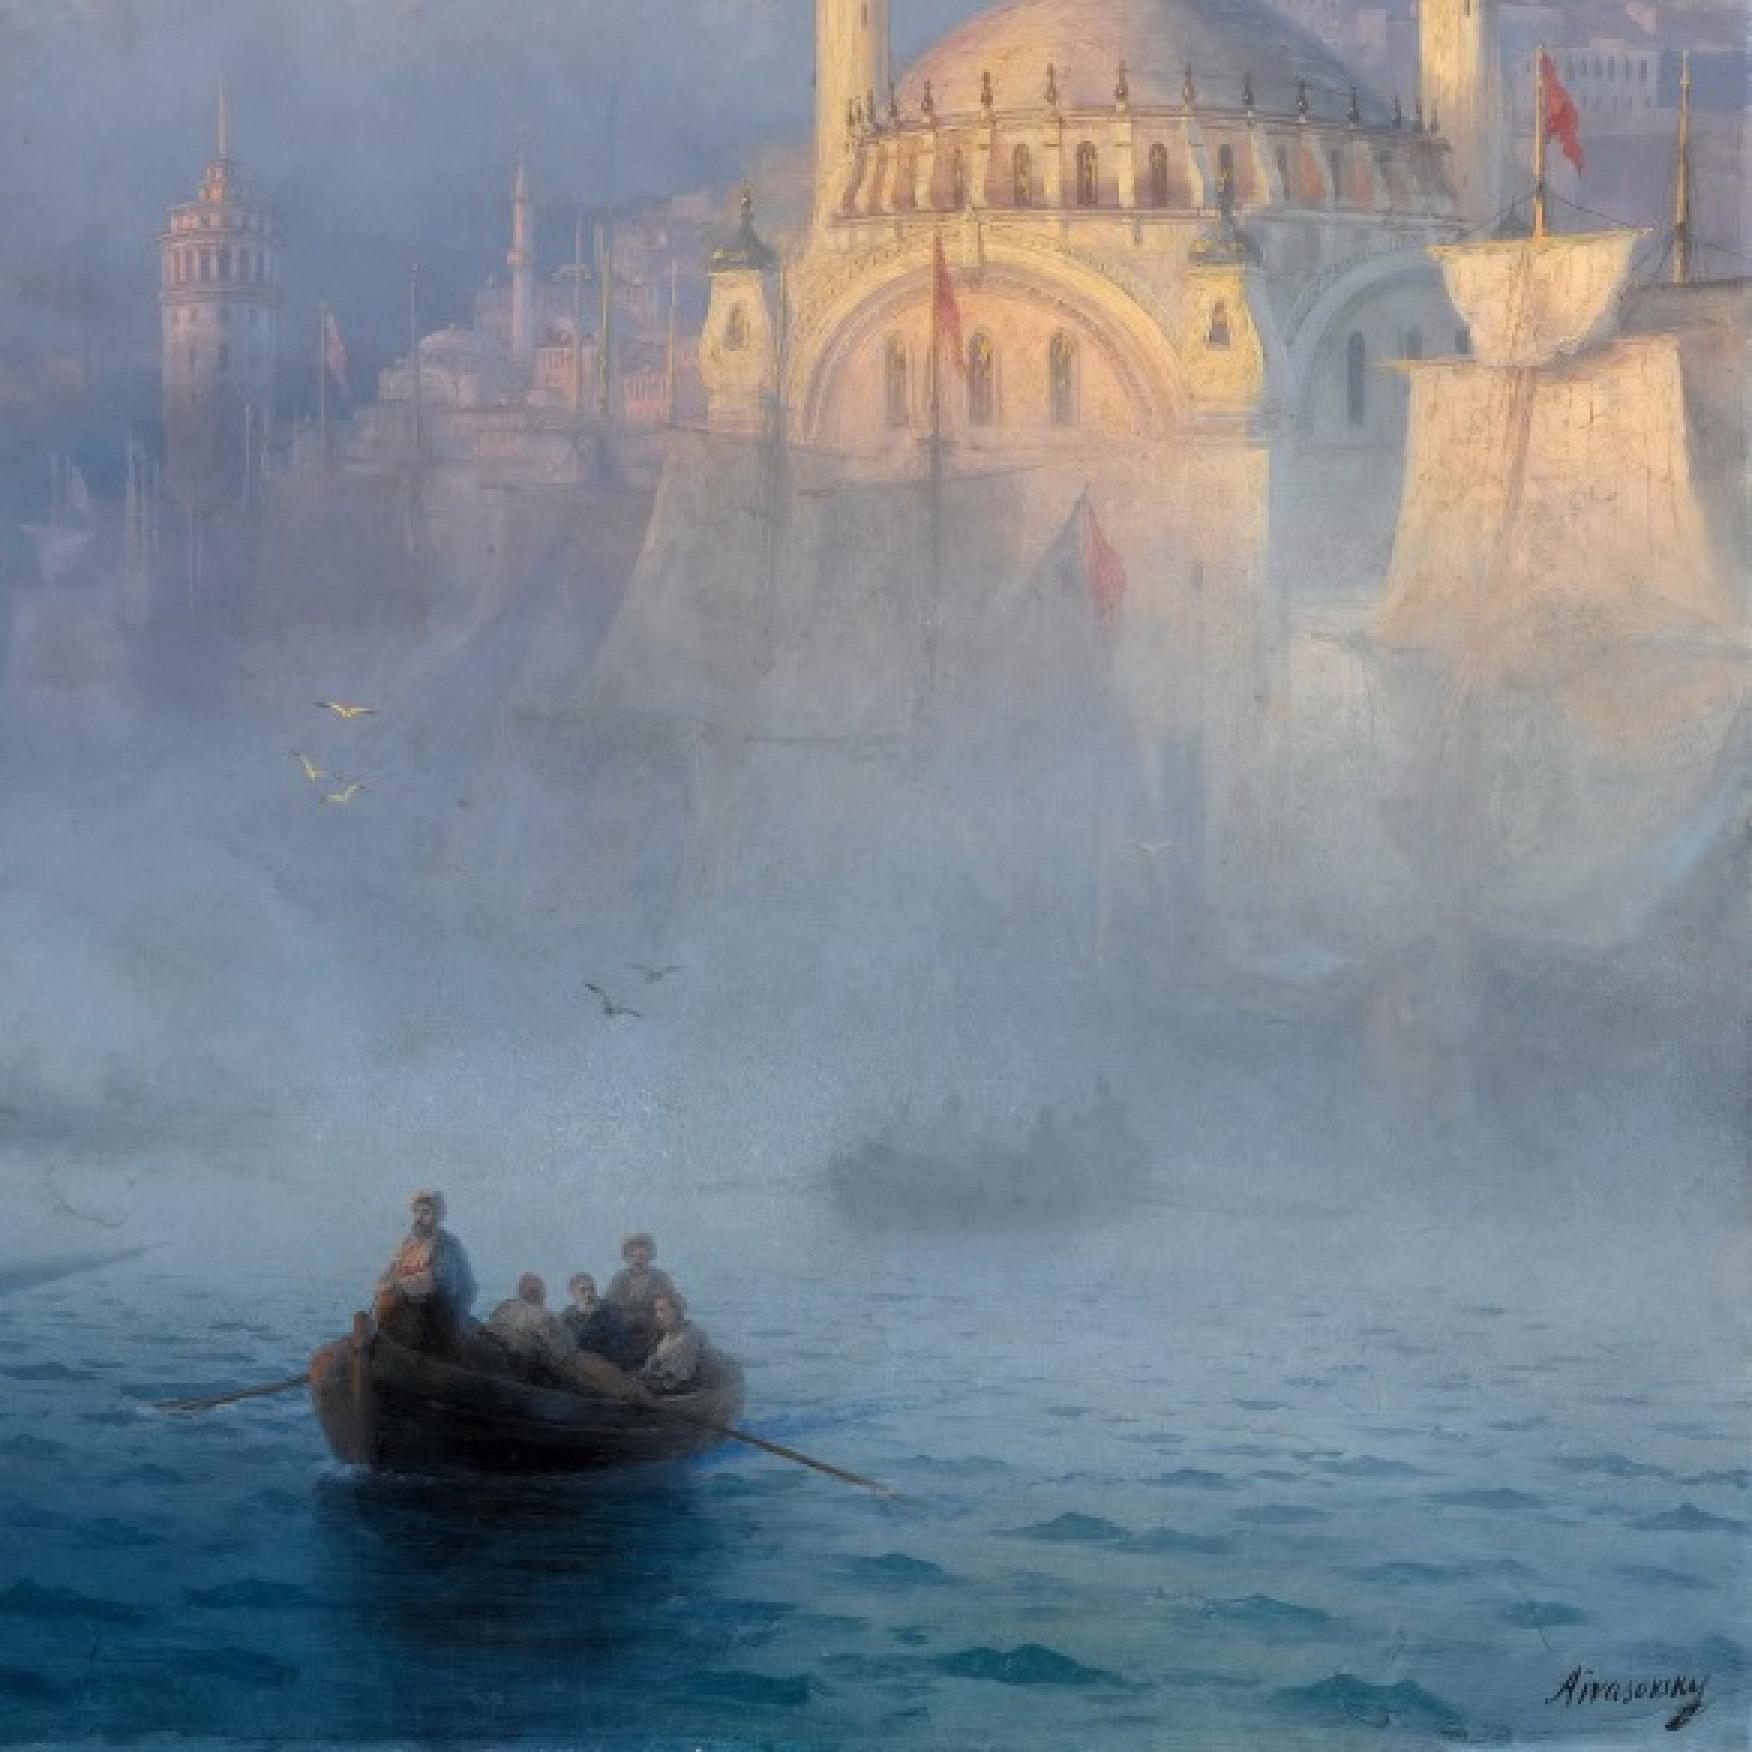 interjero detale Ivan Aivazovsky - Constantinople I